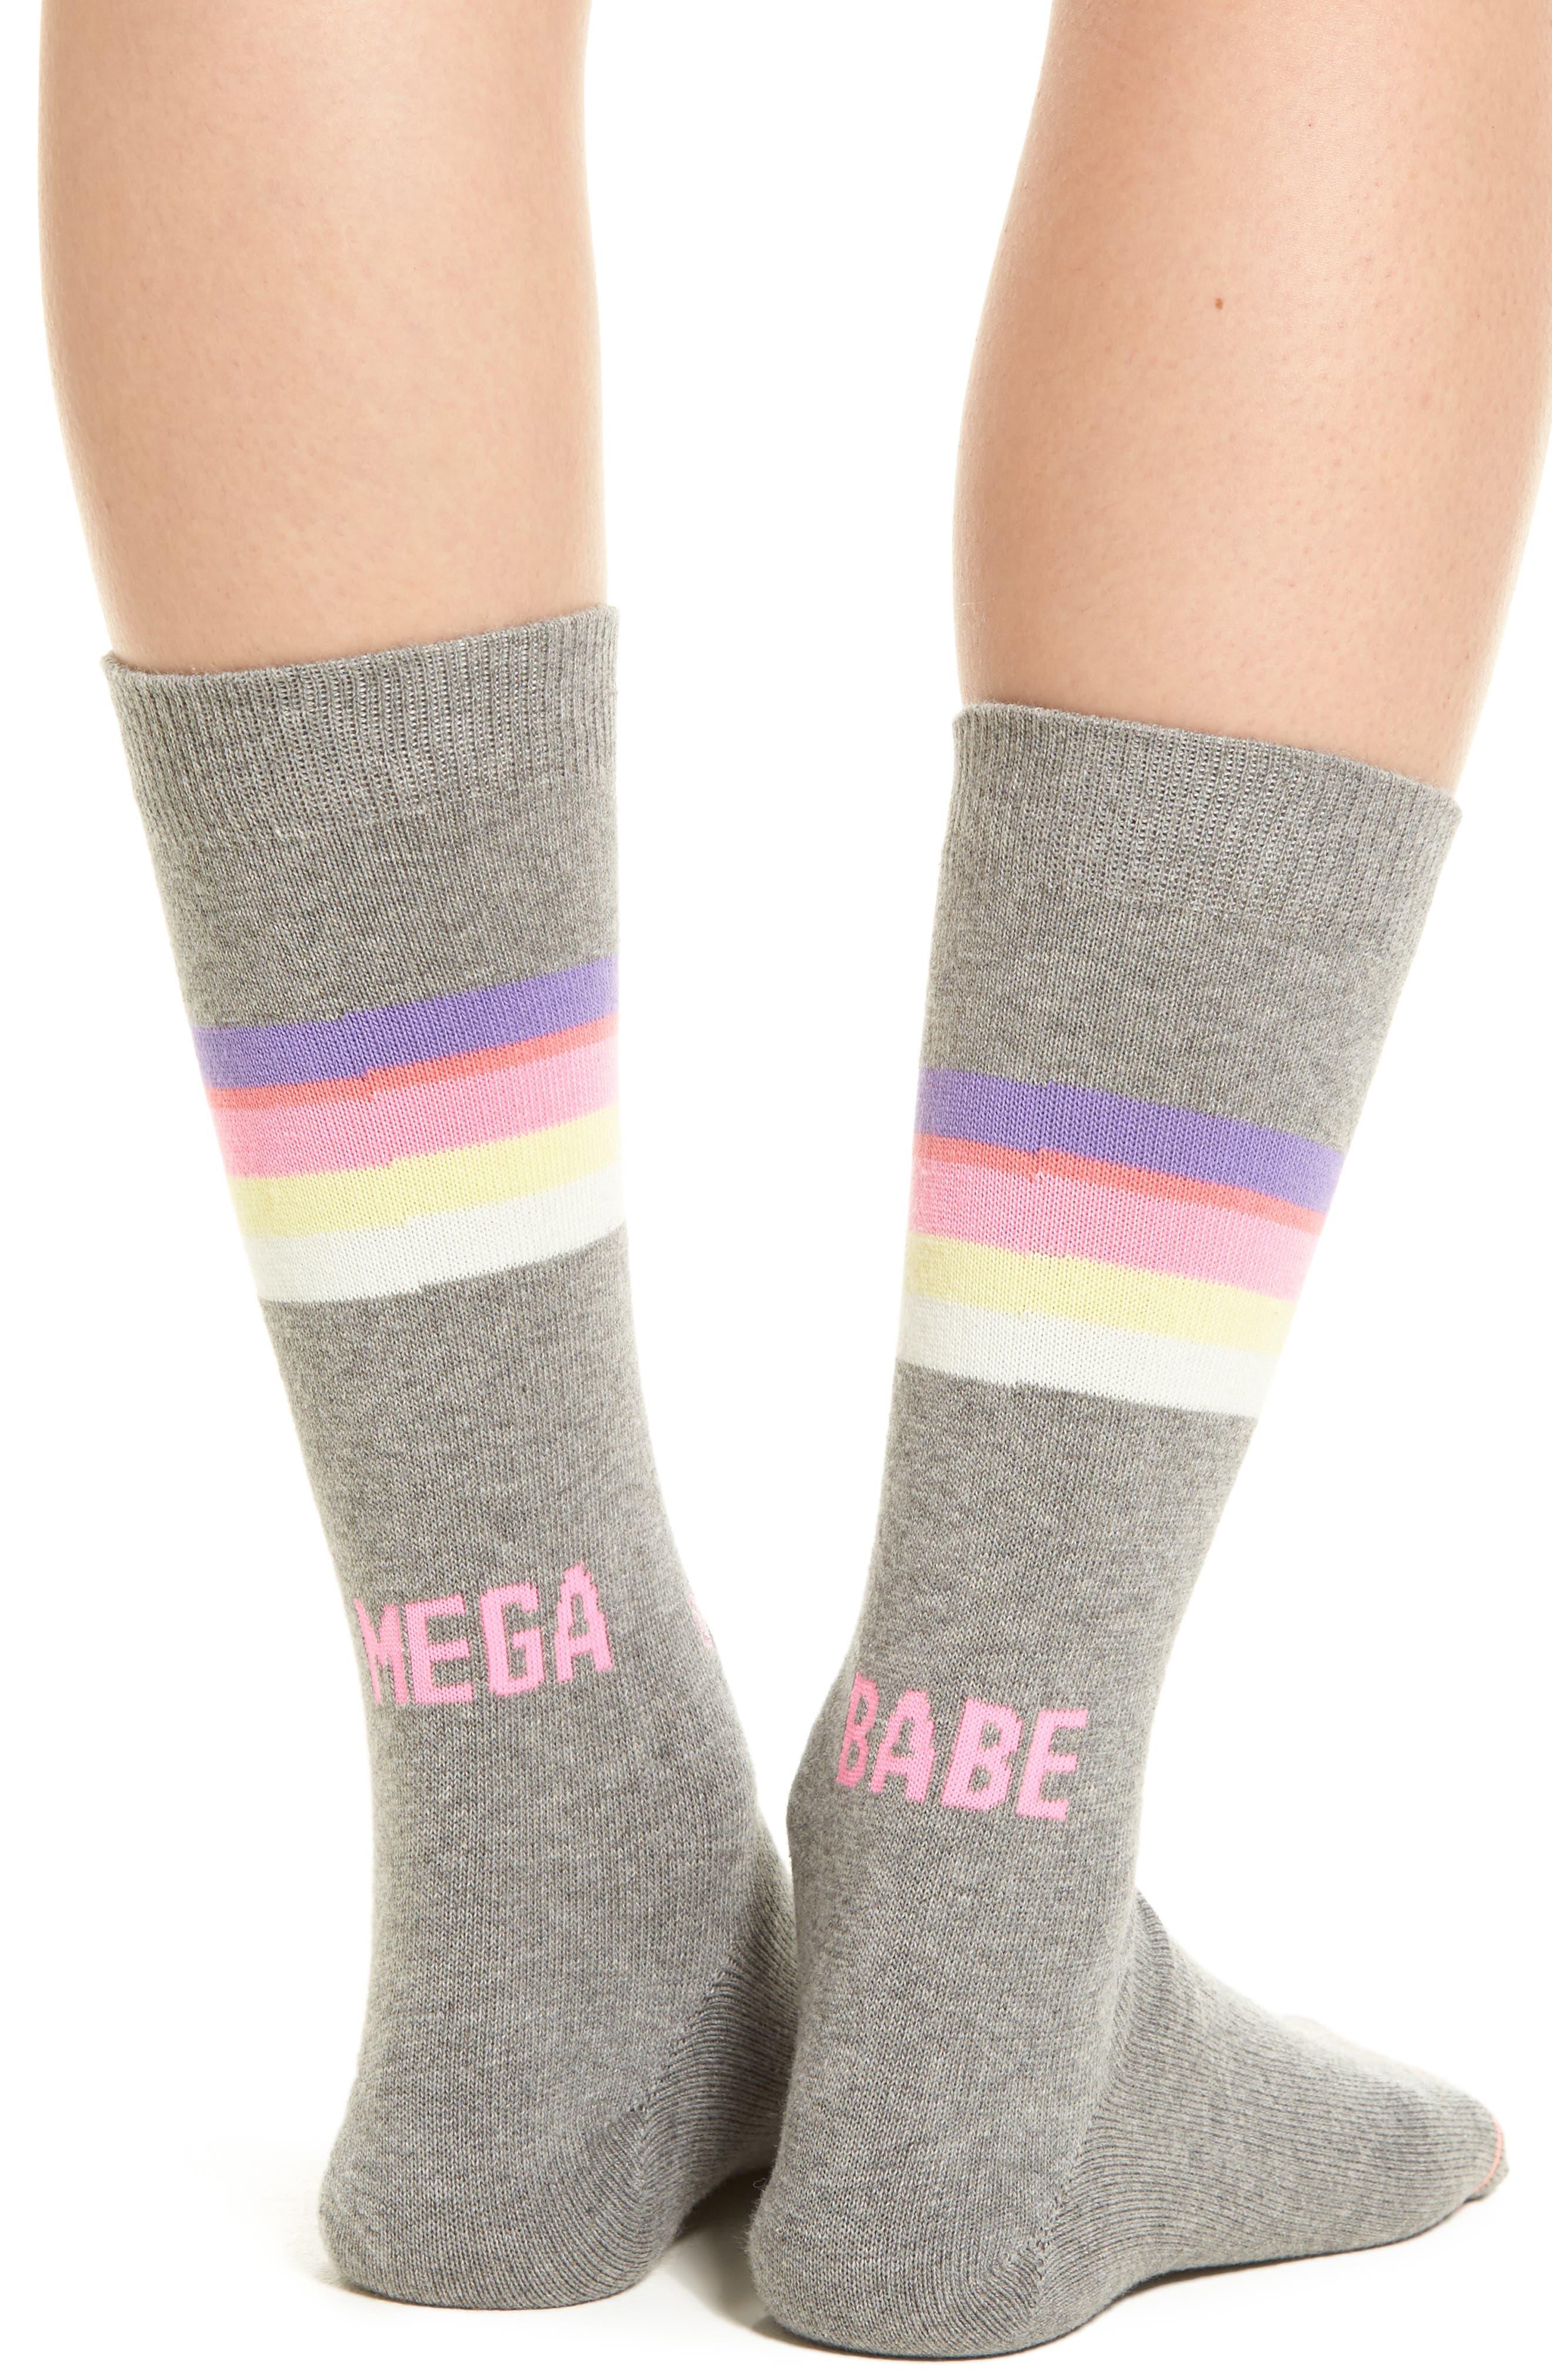 Mega Babe Tomboy Crew Socks,                             Alternate thumbnail 2, color,                             020